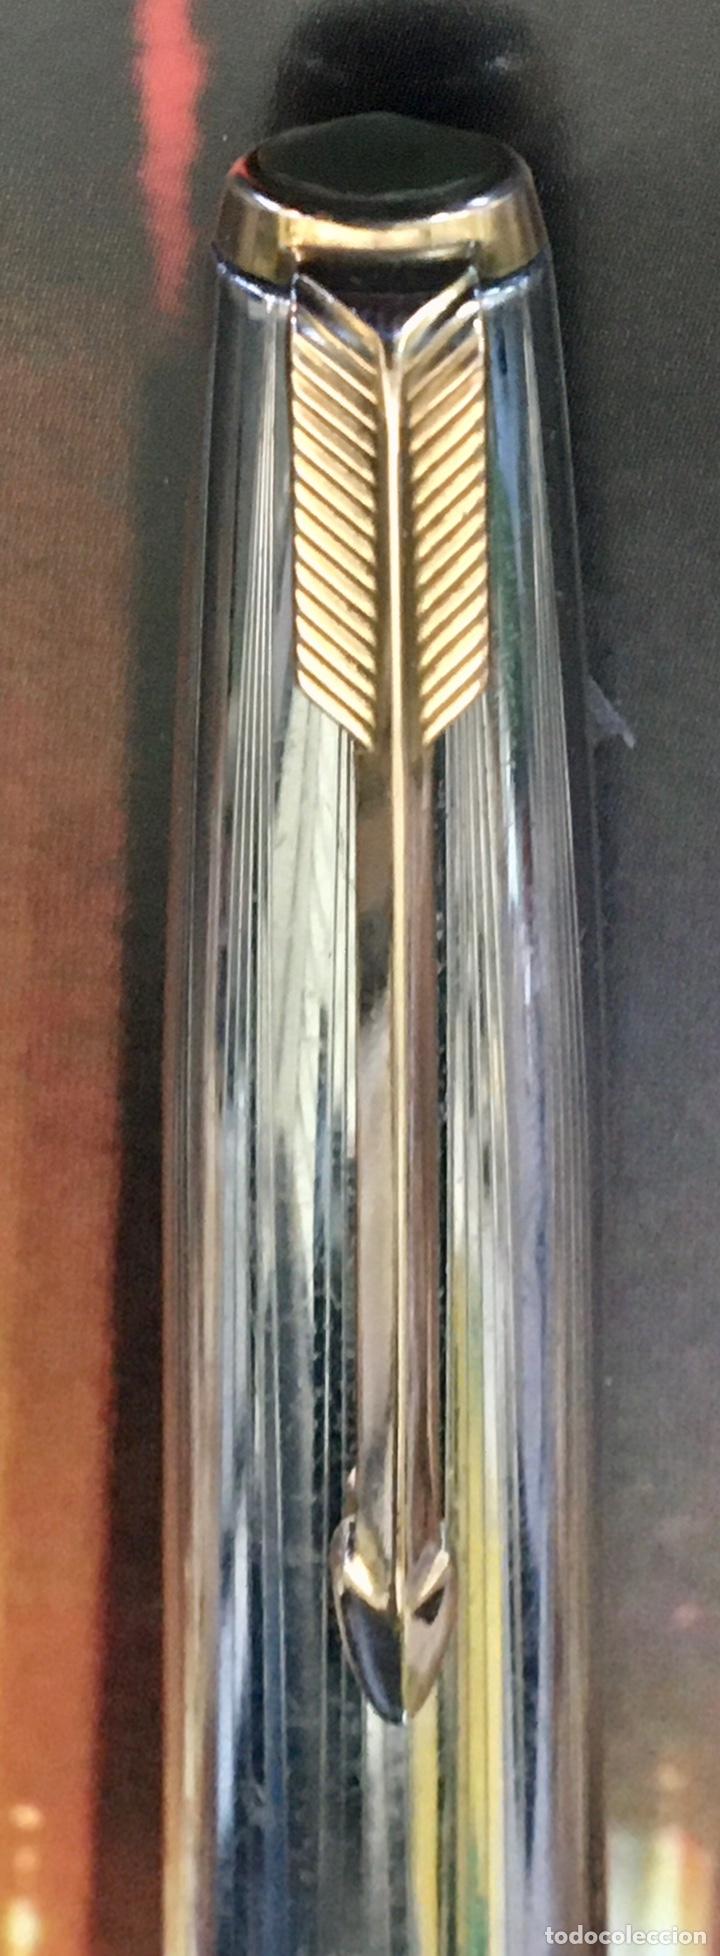 Plumas estilográficas antiguas: PARKER 51 R. SILVER 1950' - Foto 5 - 213399253